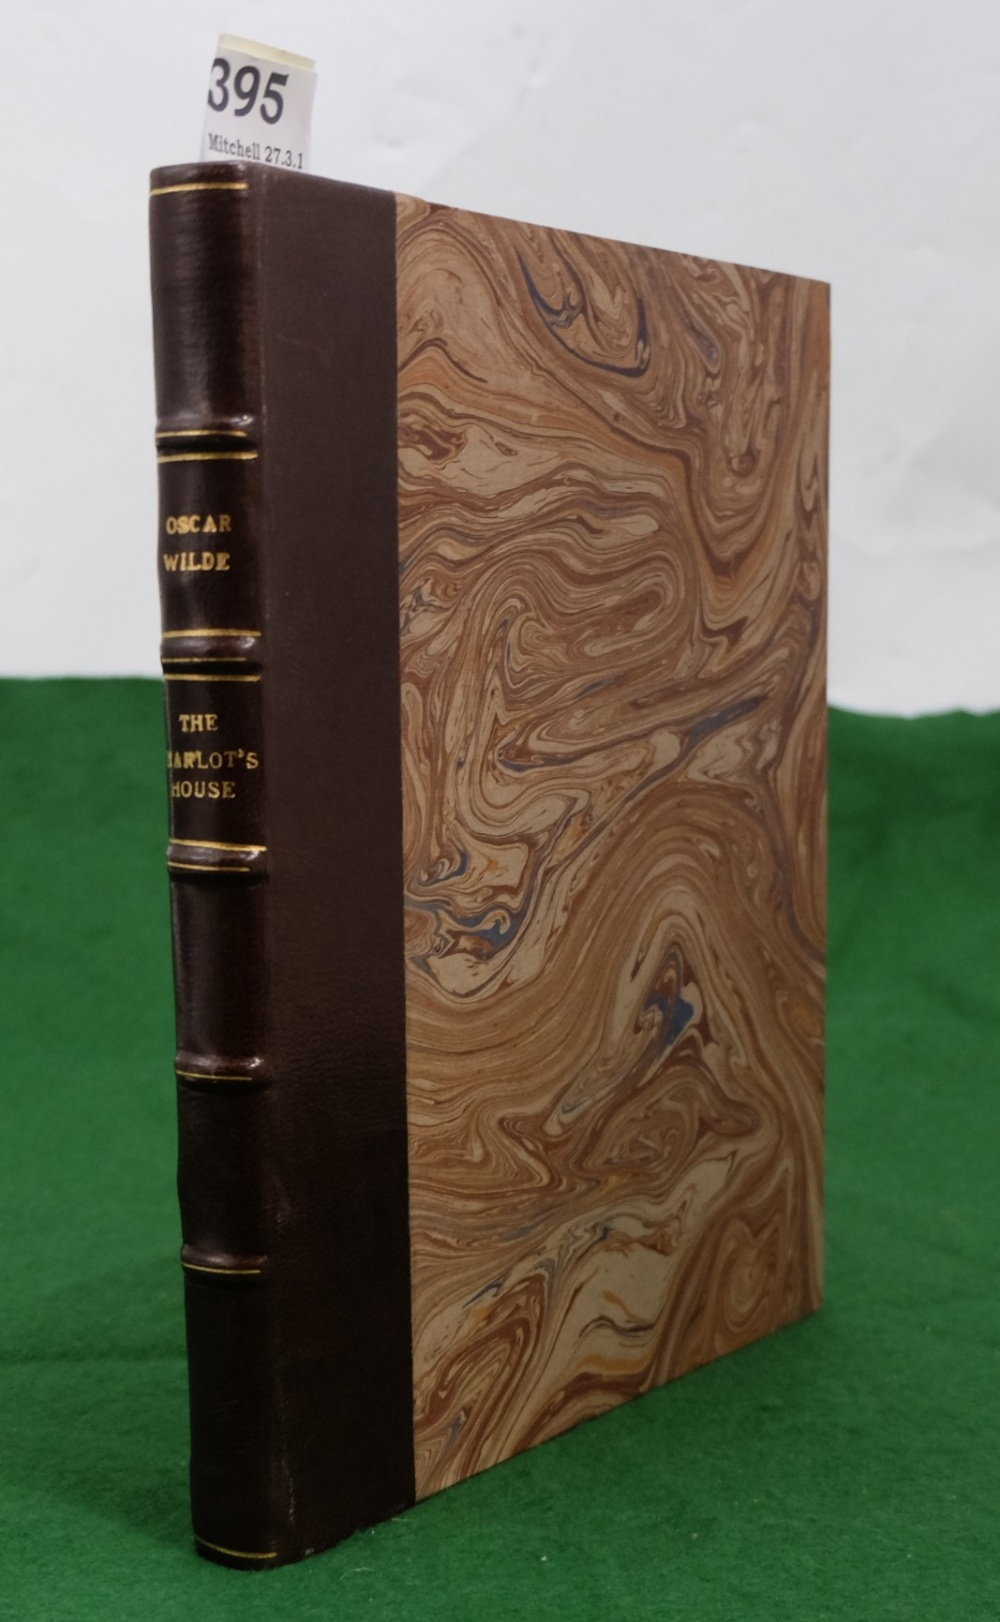 Lot 395 - BOOK - Oscar Wilde, the Harlot's House, 1929, First illustrated edition by John Vassos, New York,